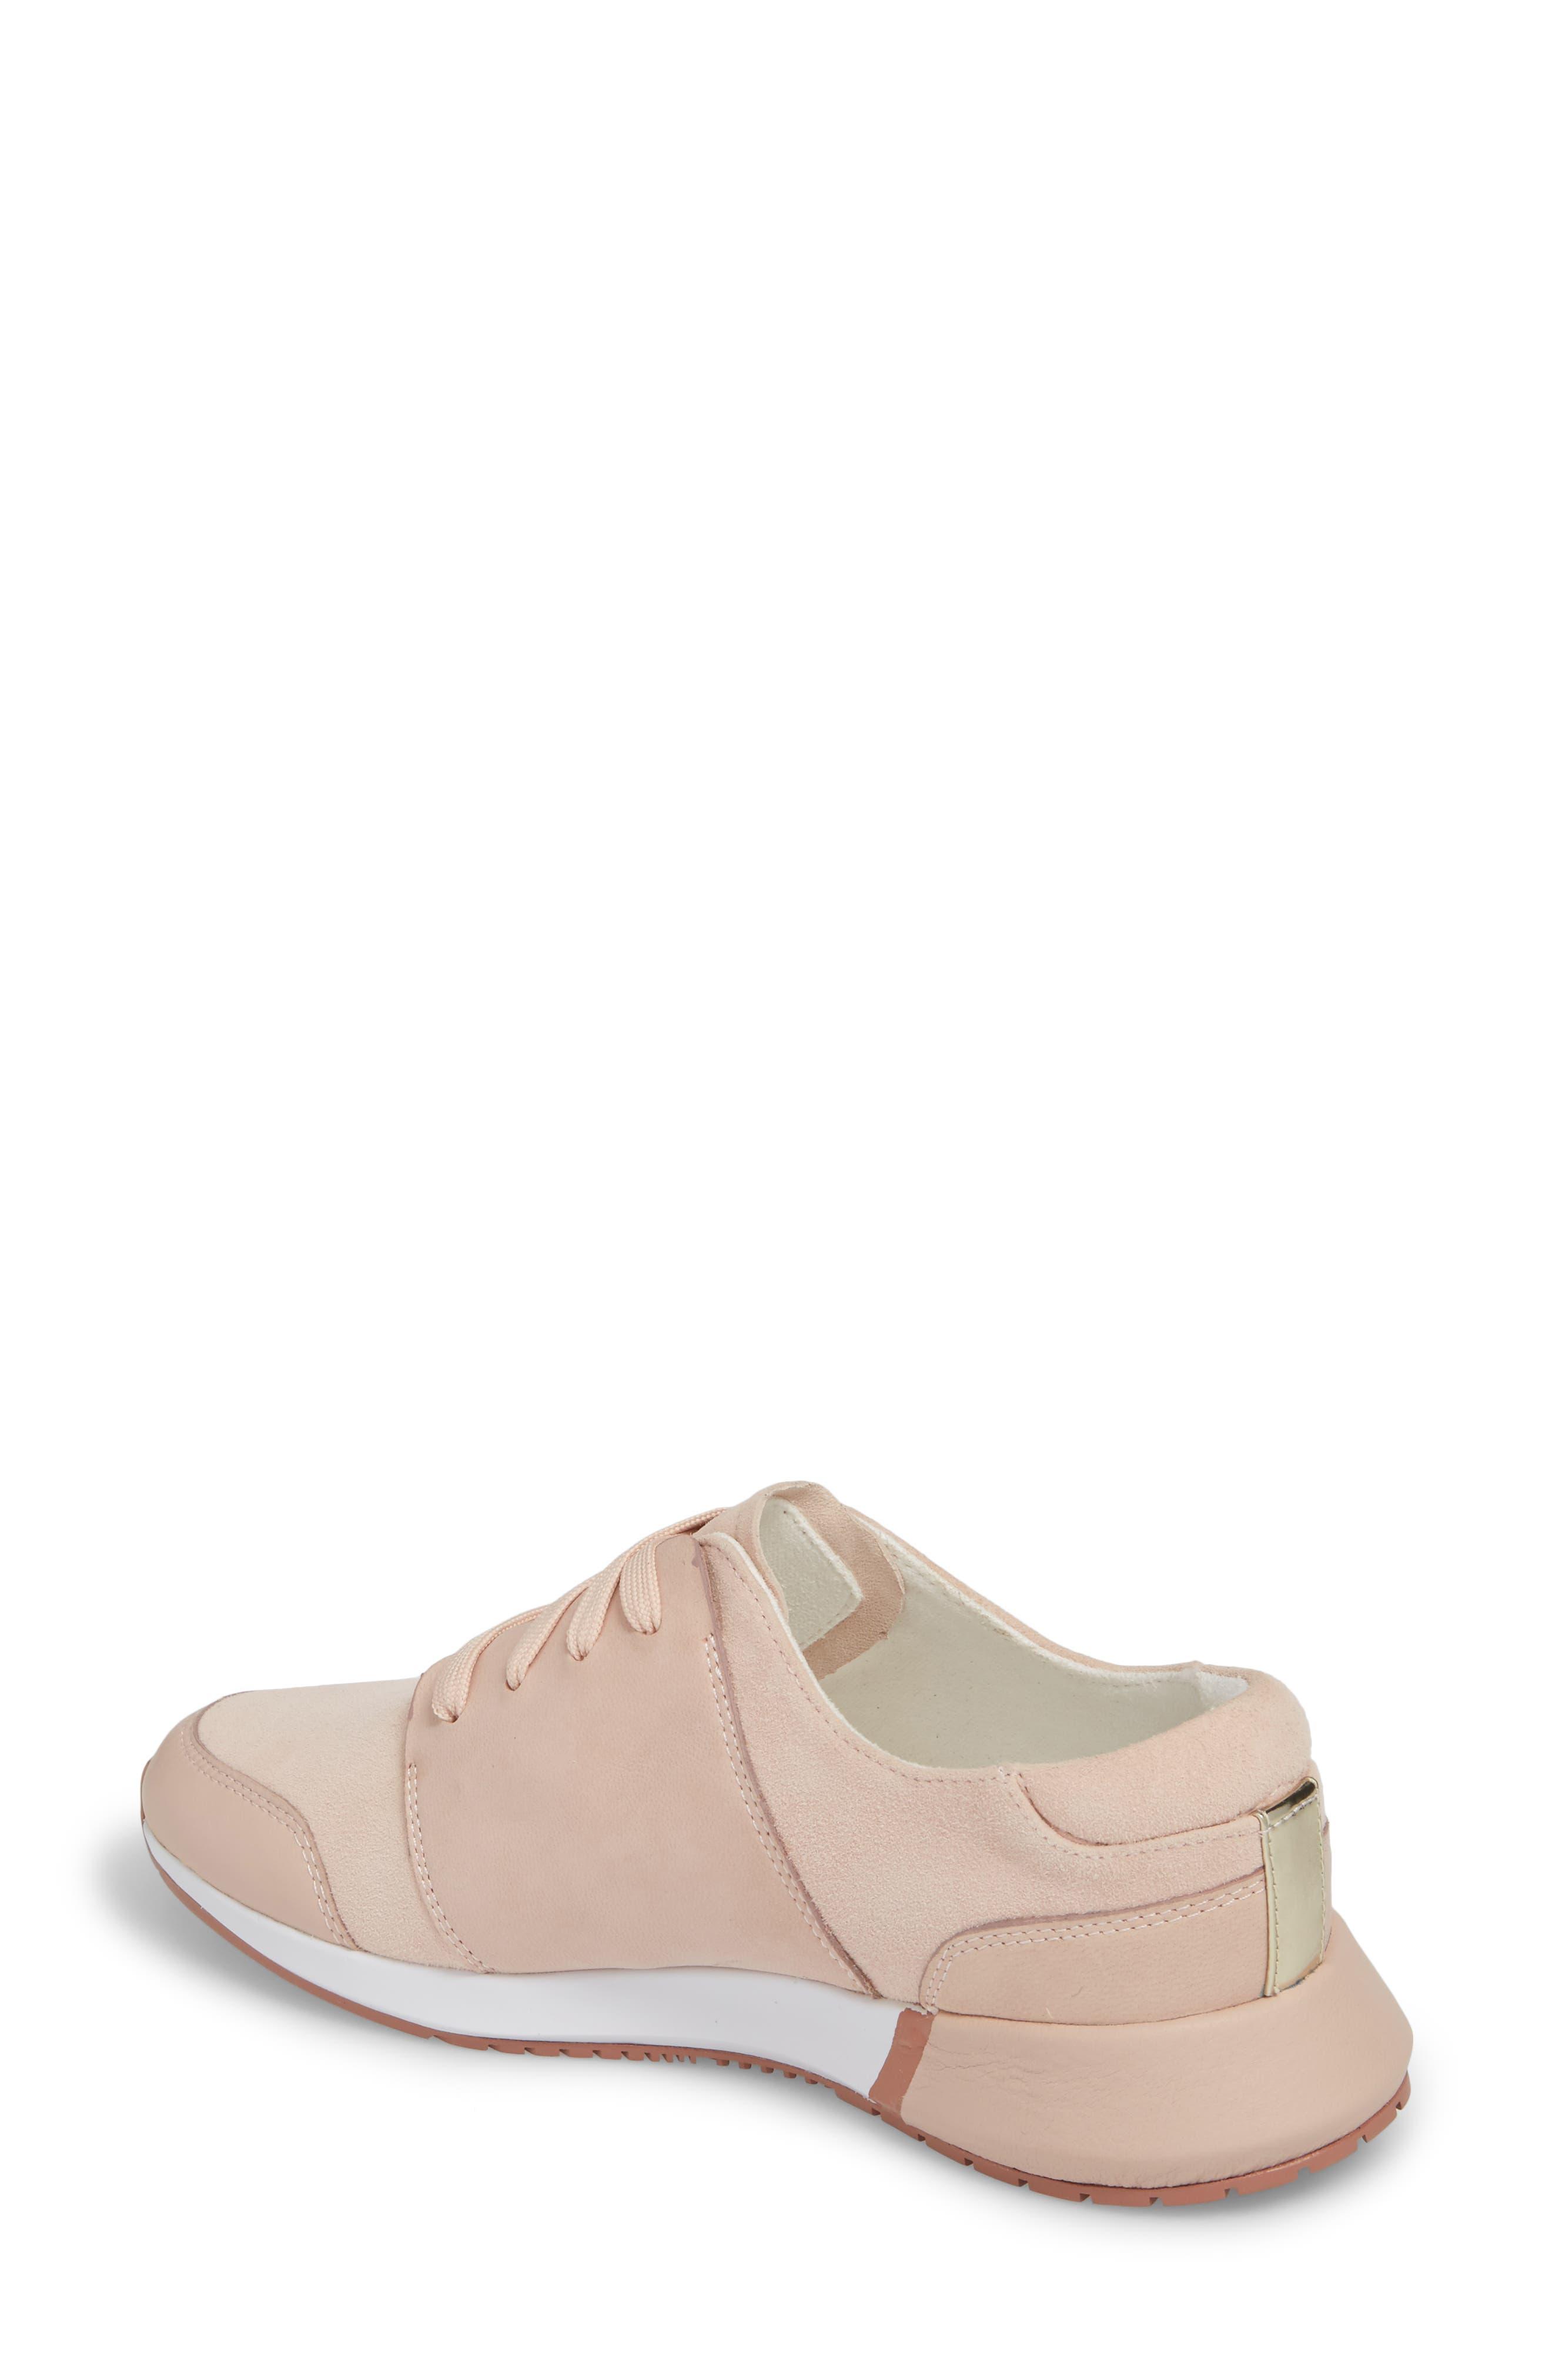 Sumner 2 Sneaker,                             Alternate thumbnail 2, color,                             Rose Suede